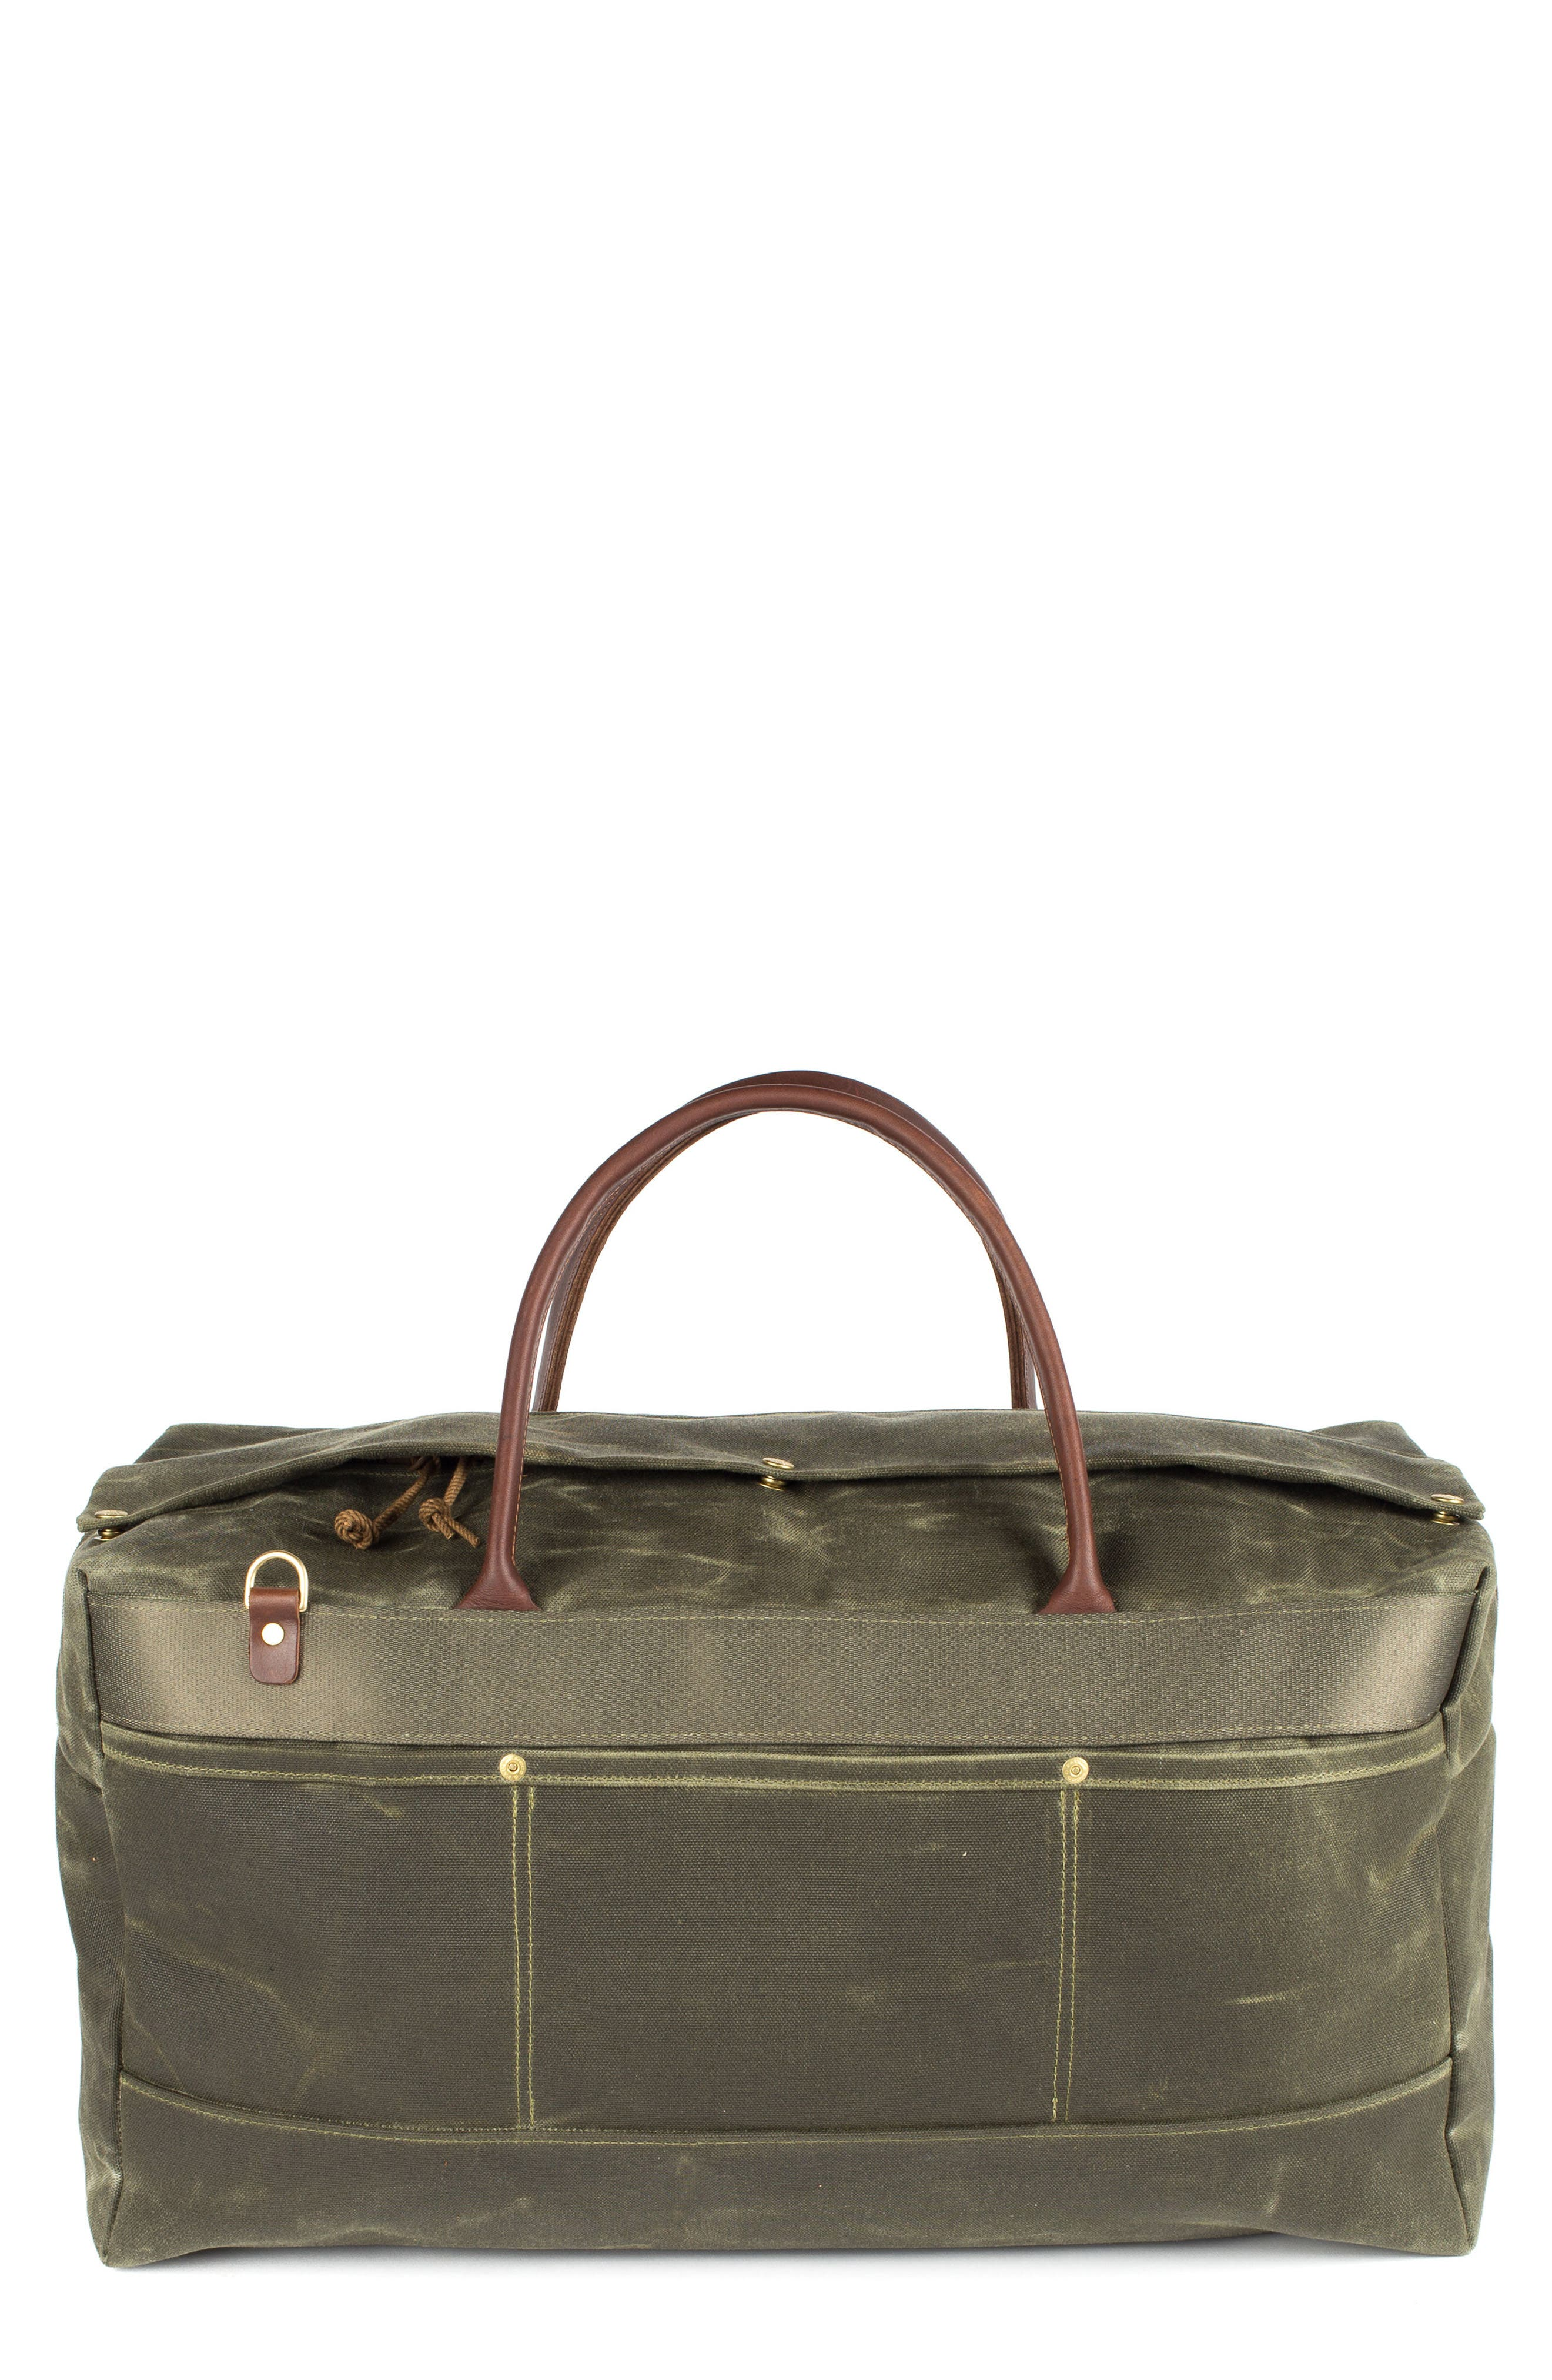 Grand Tourer Waxed Canvas Duffel Bag,                             Main thumbnail 1, color,                             Balmoral Moss